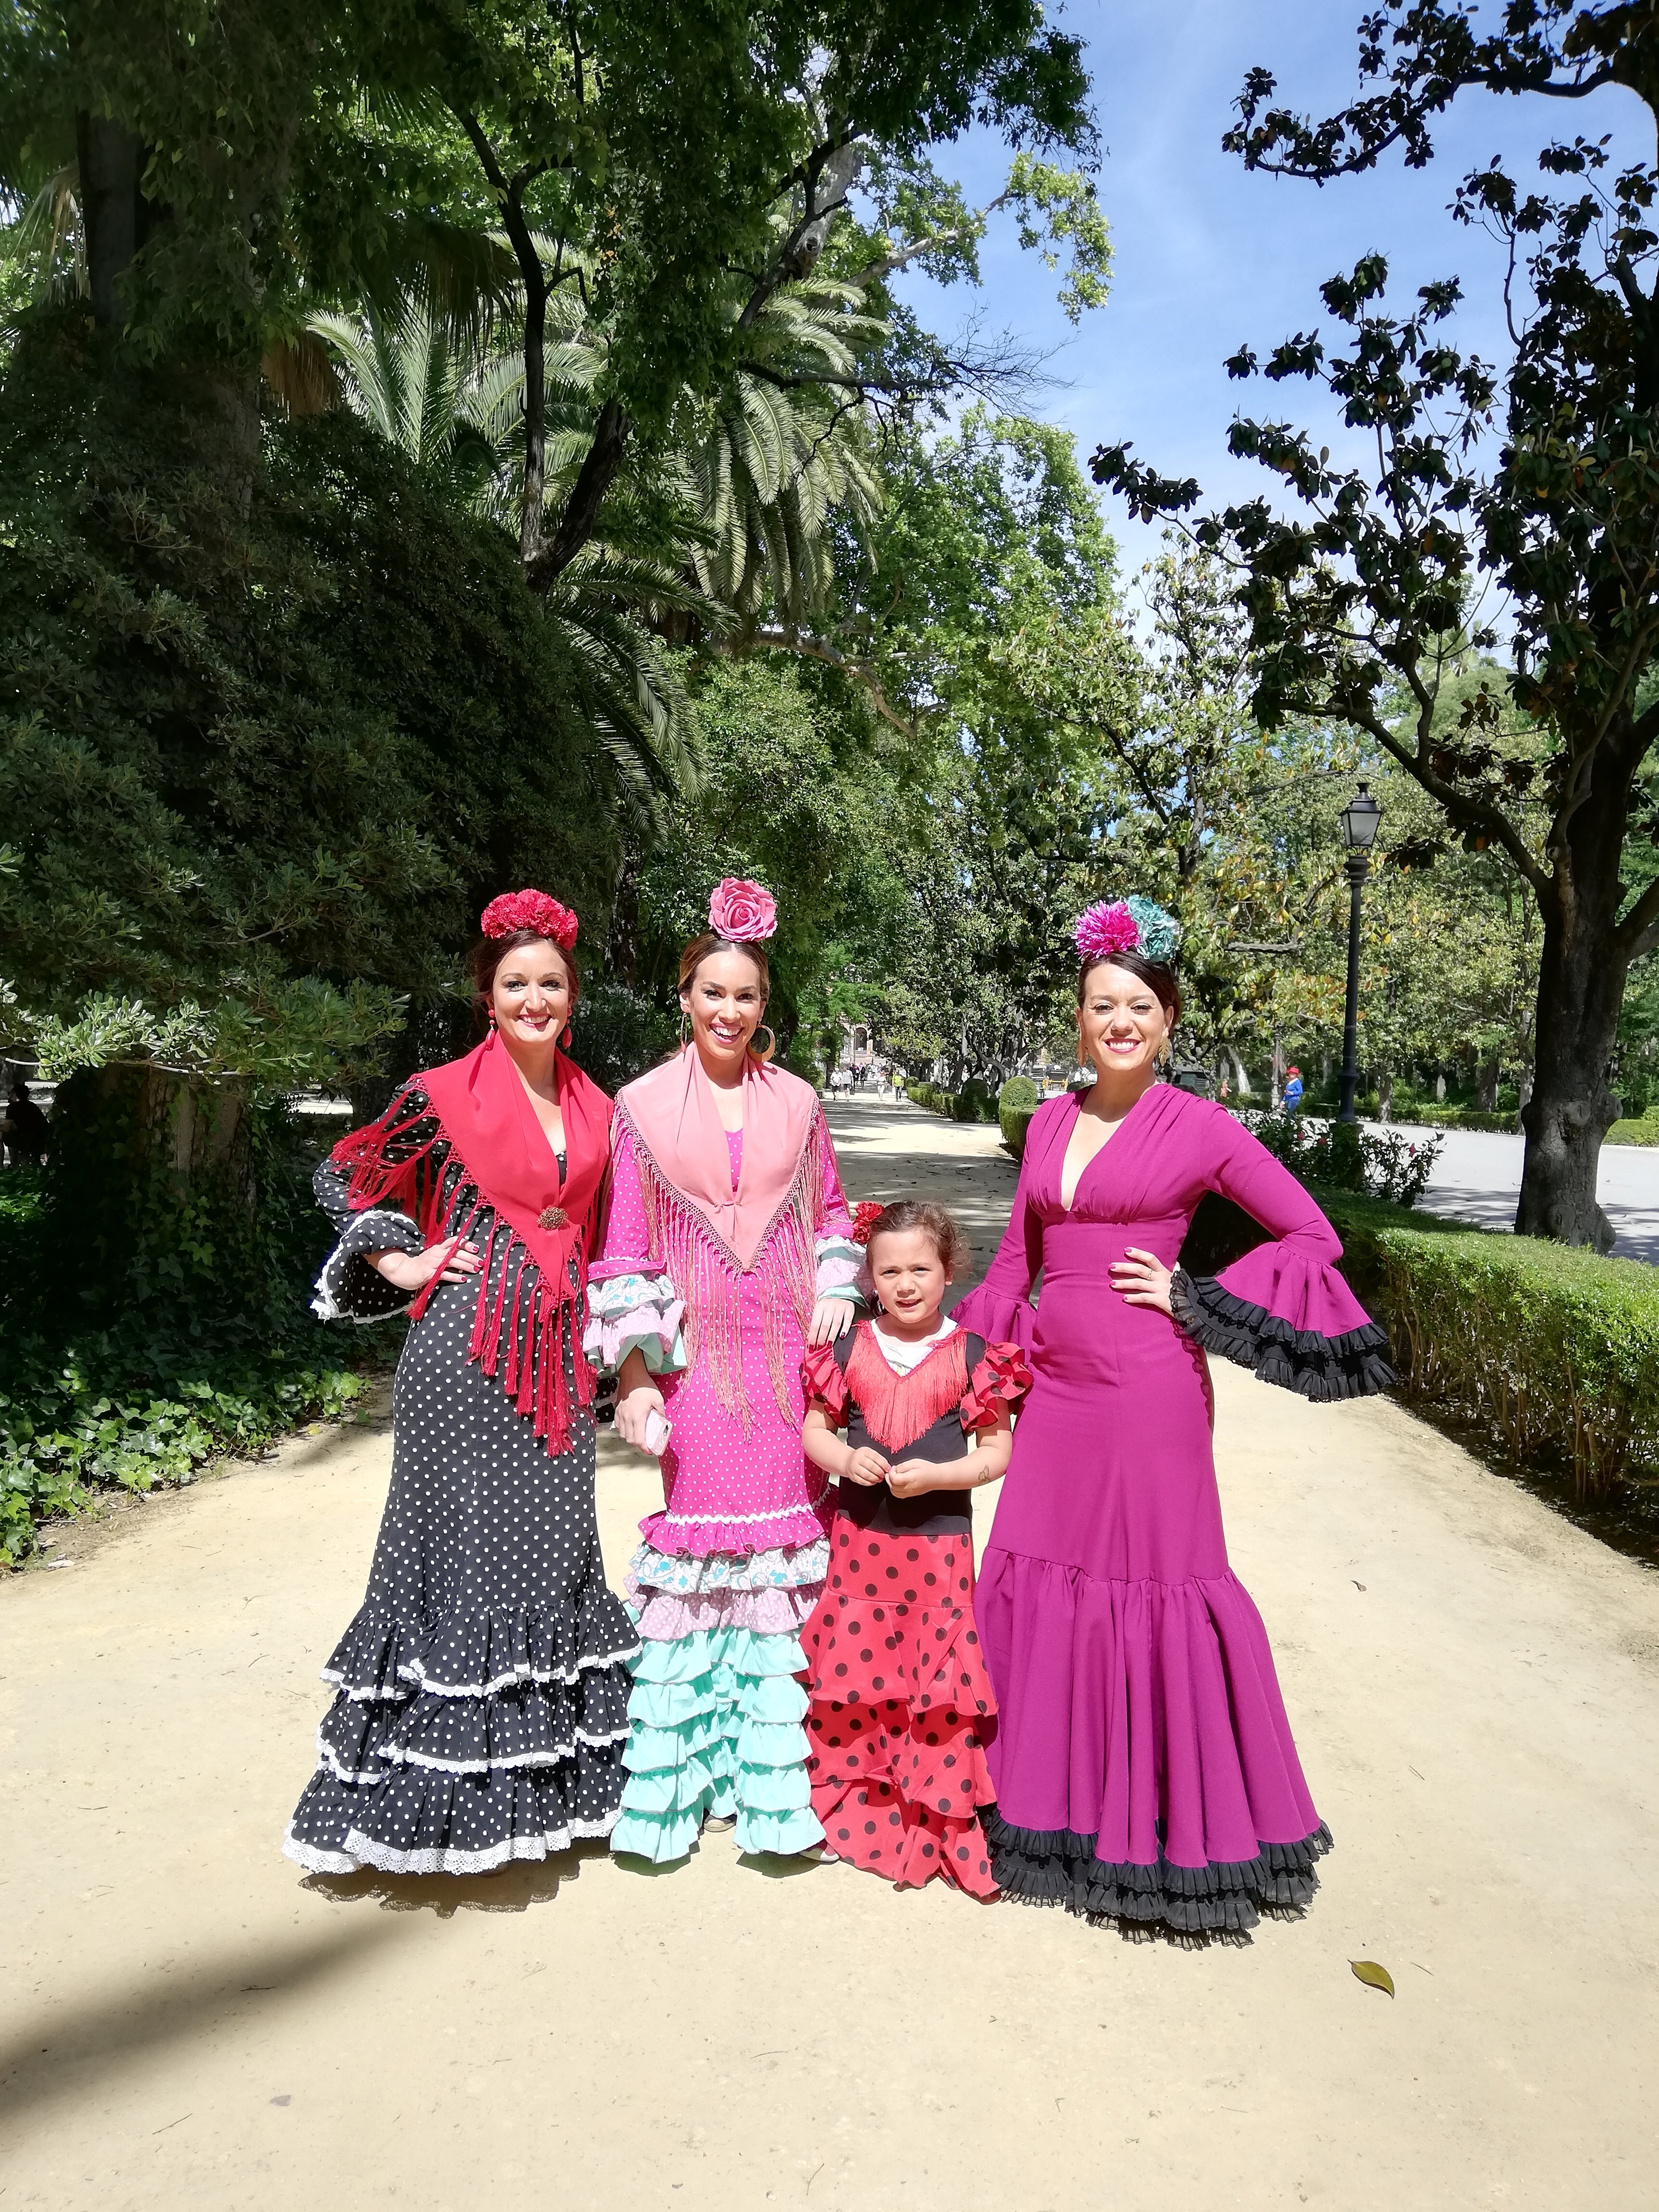 Flamencas a Siviglia